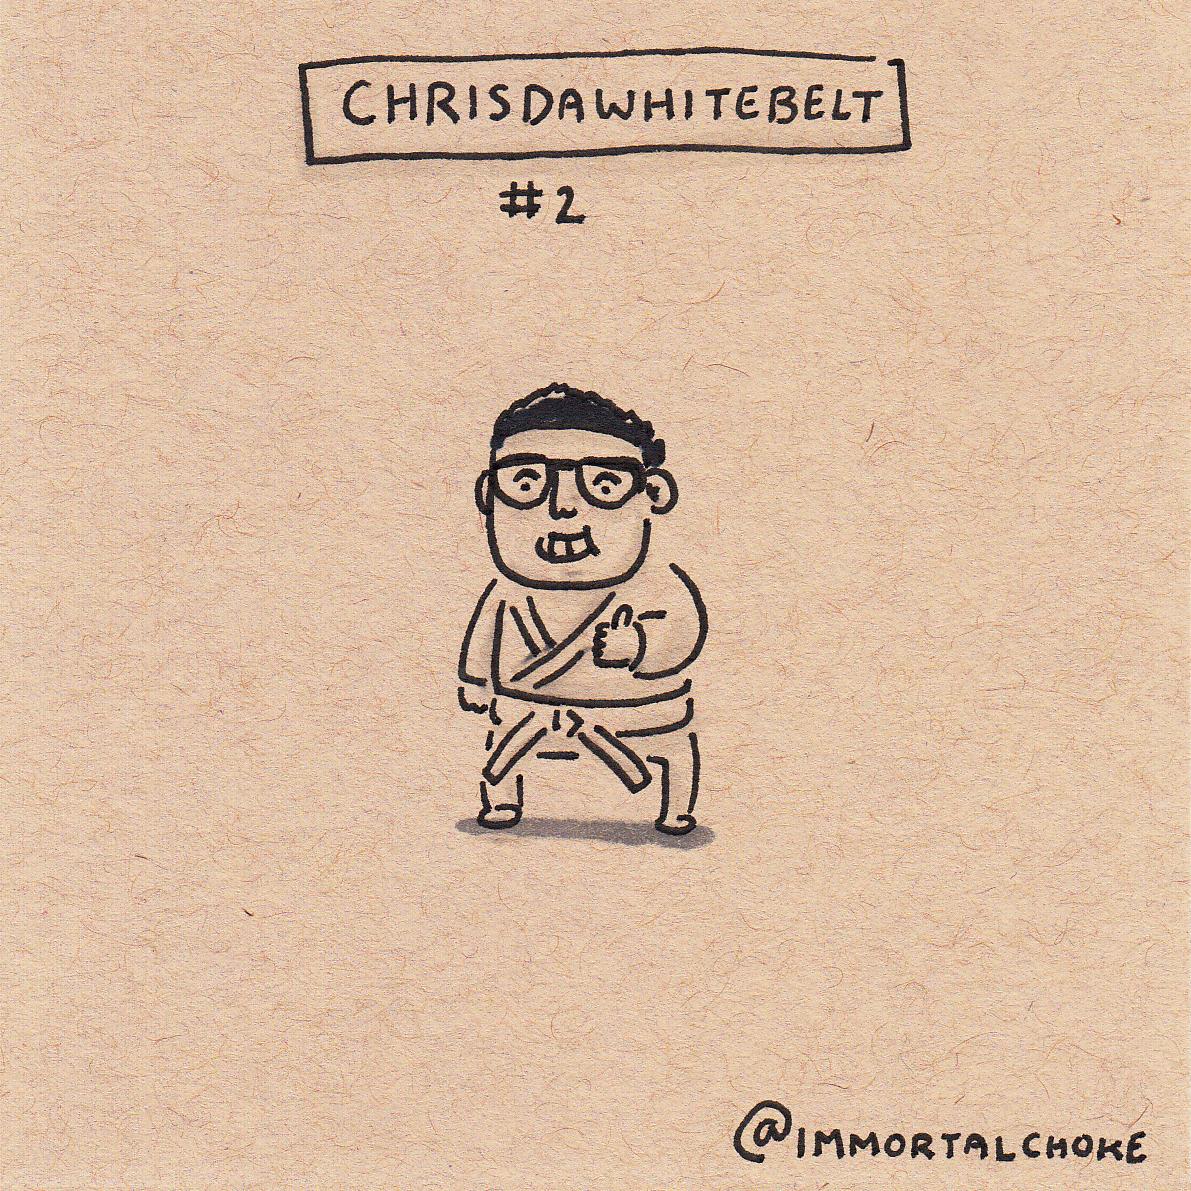 2---chrisdawhitebelt.jpg